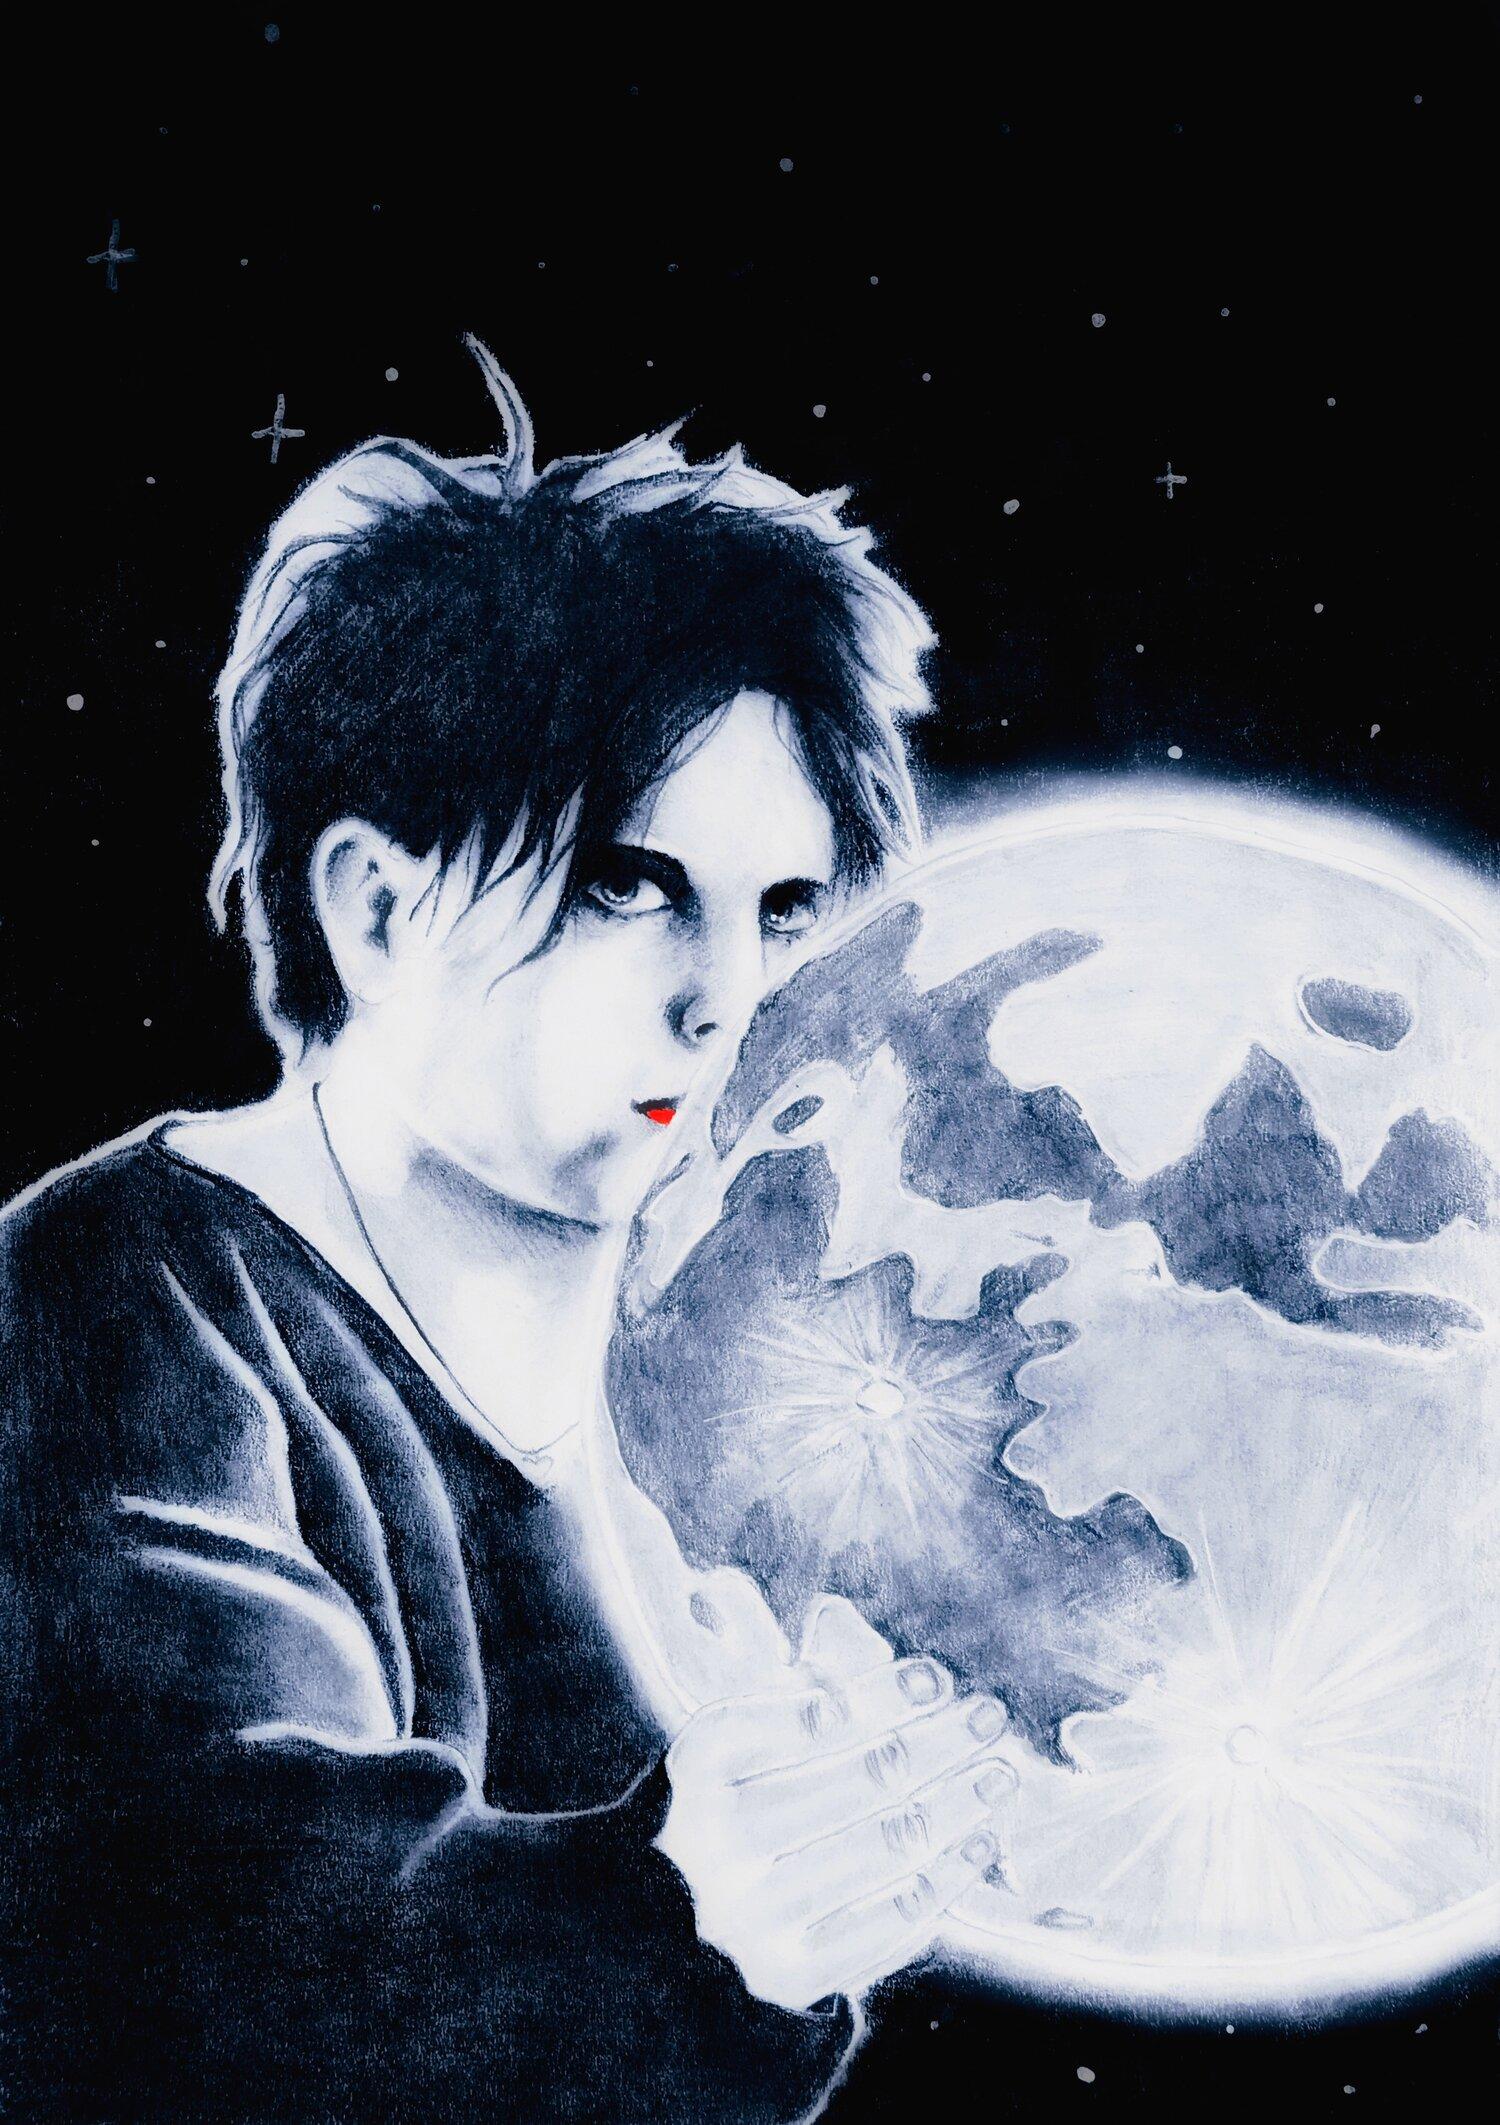 Robert Smith by Lina Moon